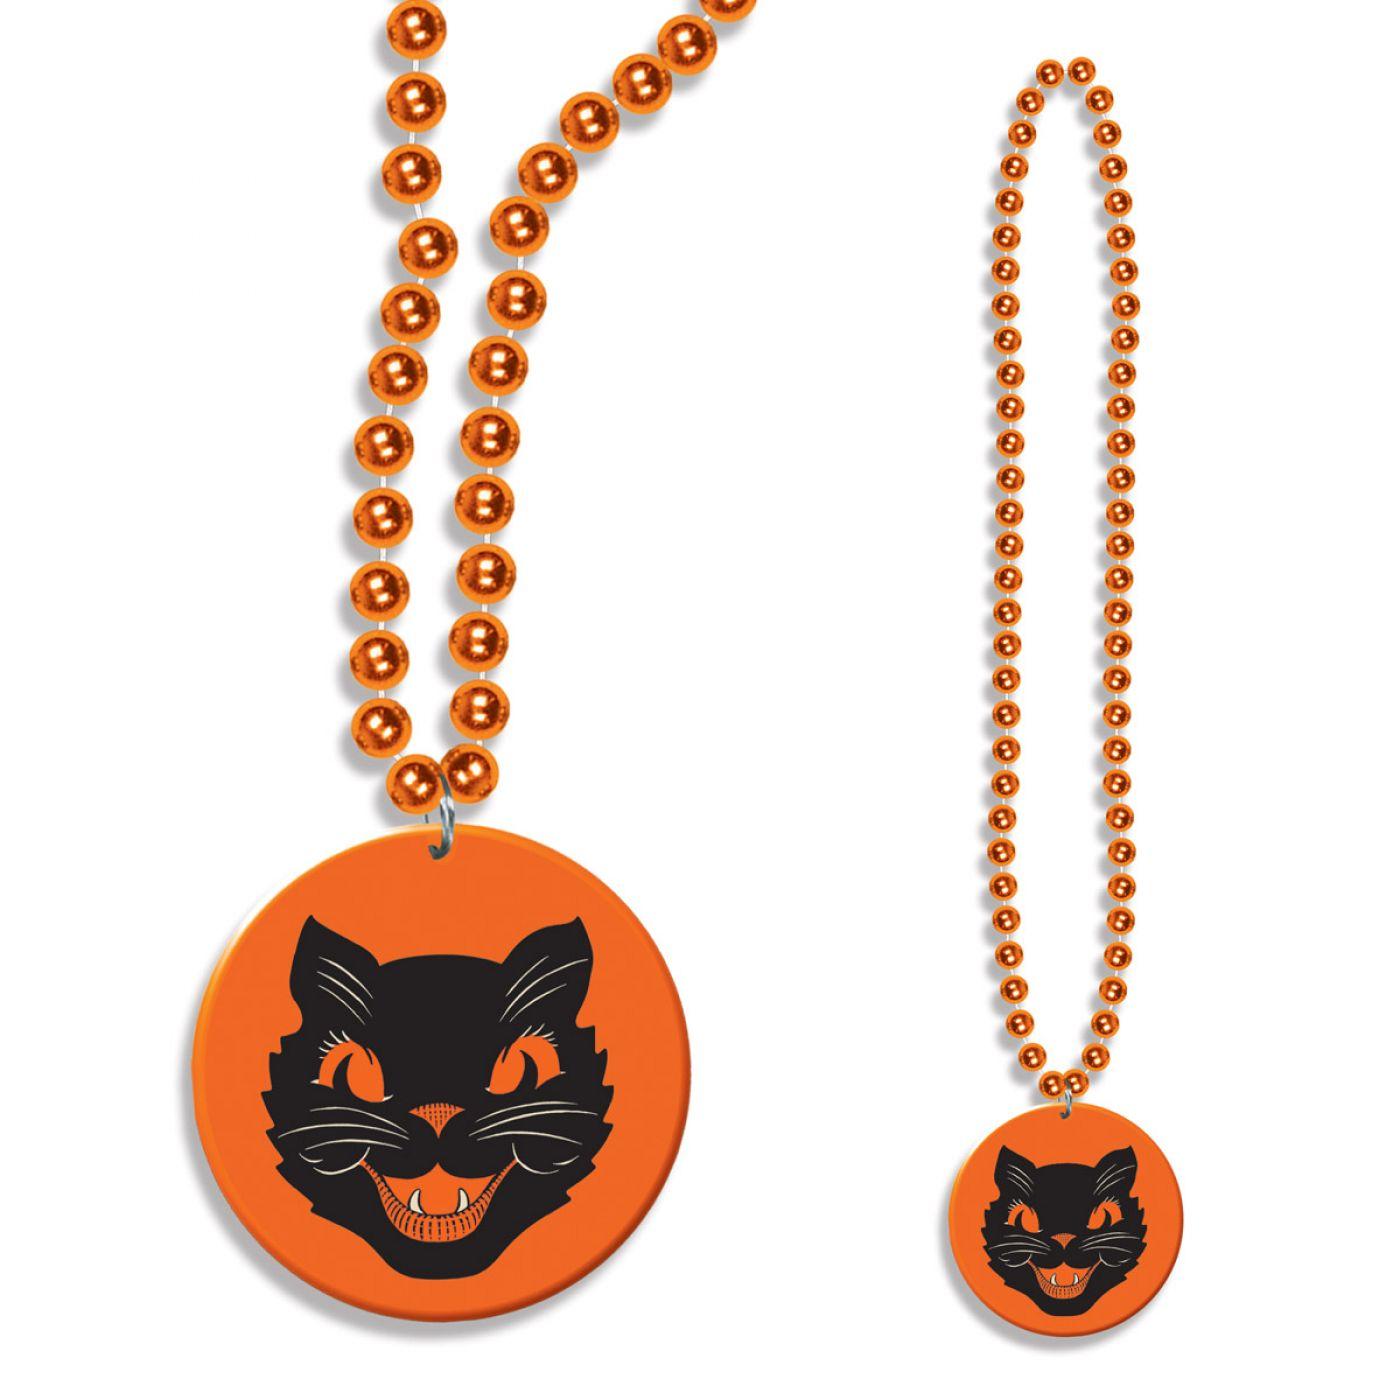 Beads w/Cat Medallion image